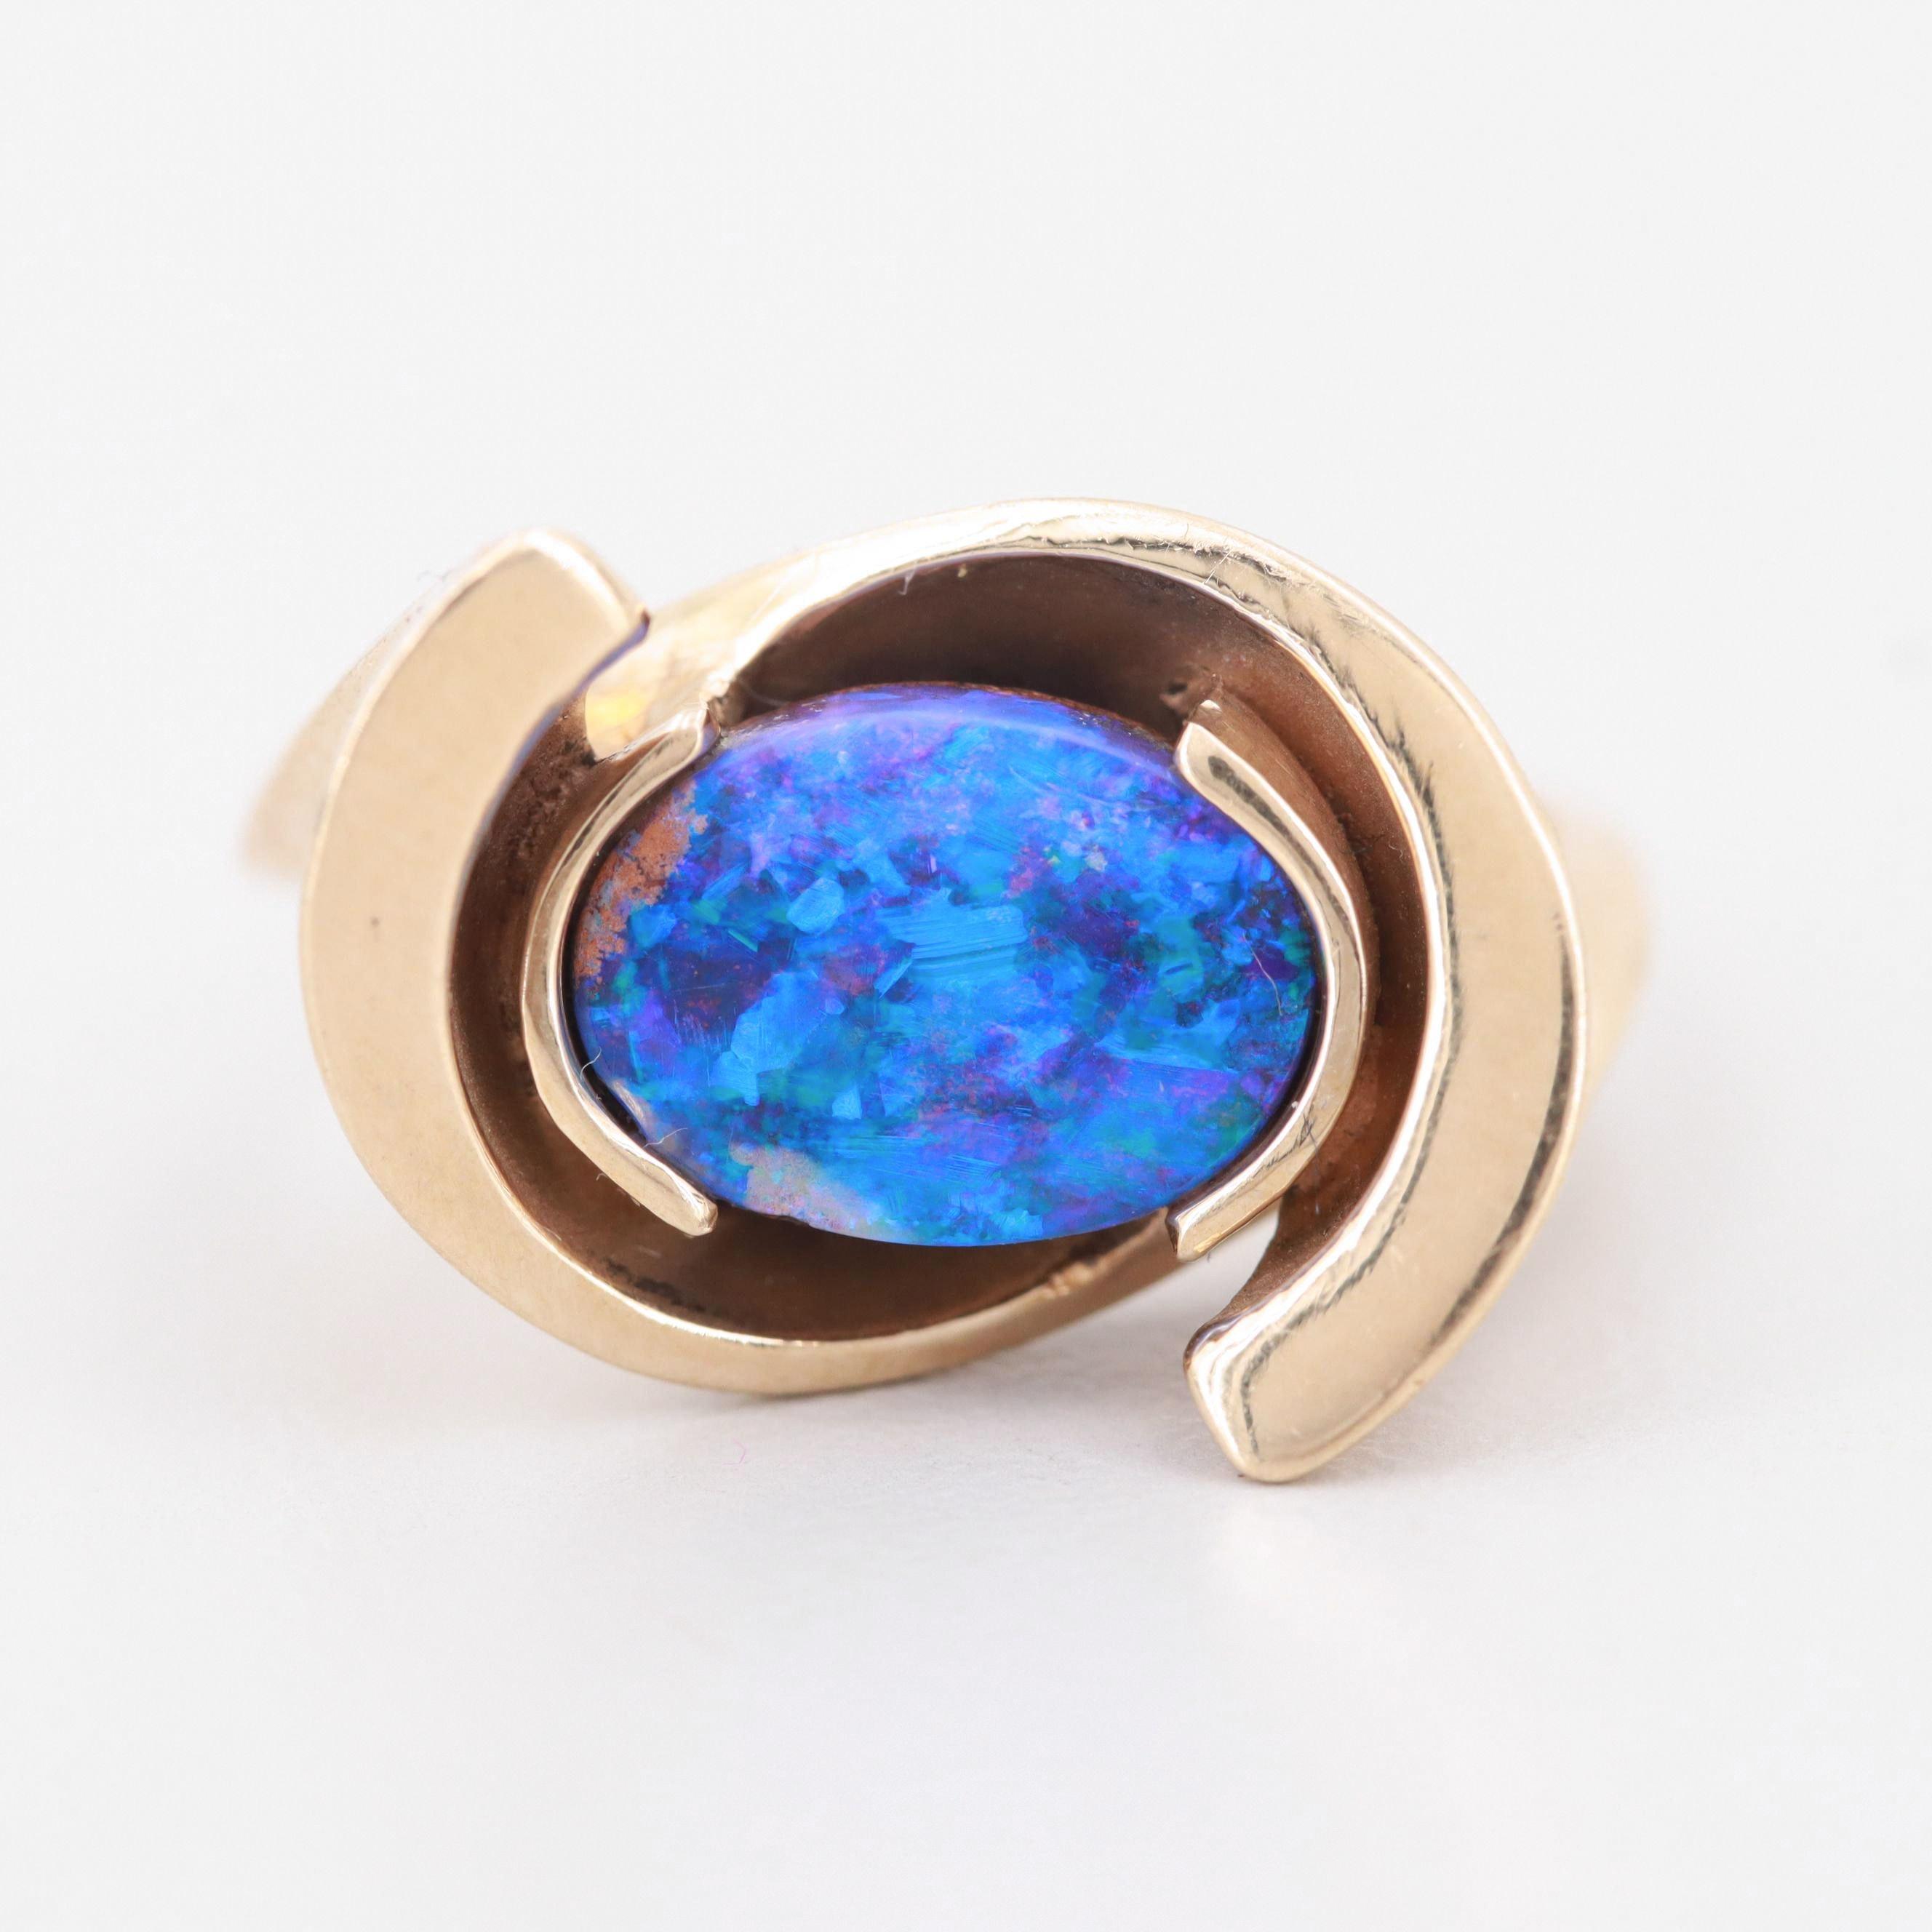 14K Yellow Gold Boulder Opal Ring